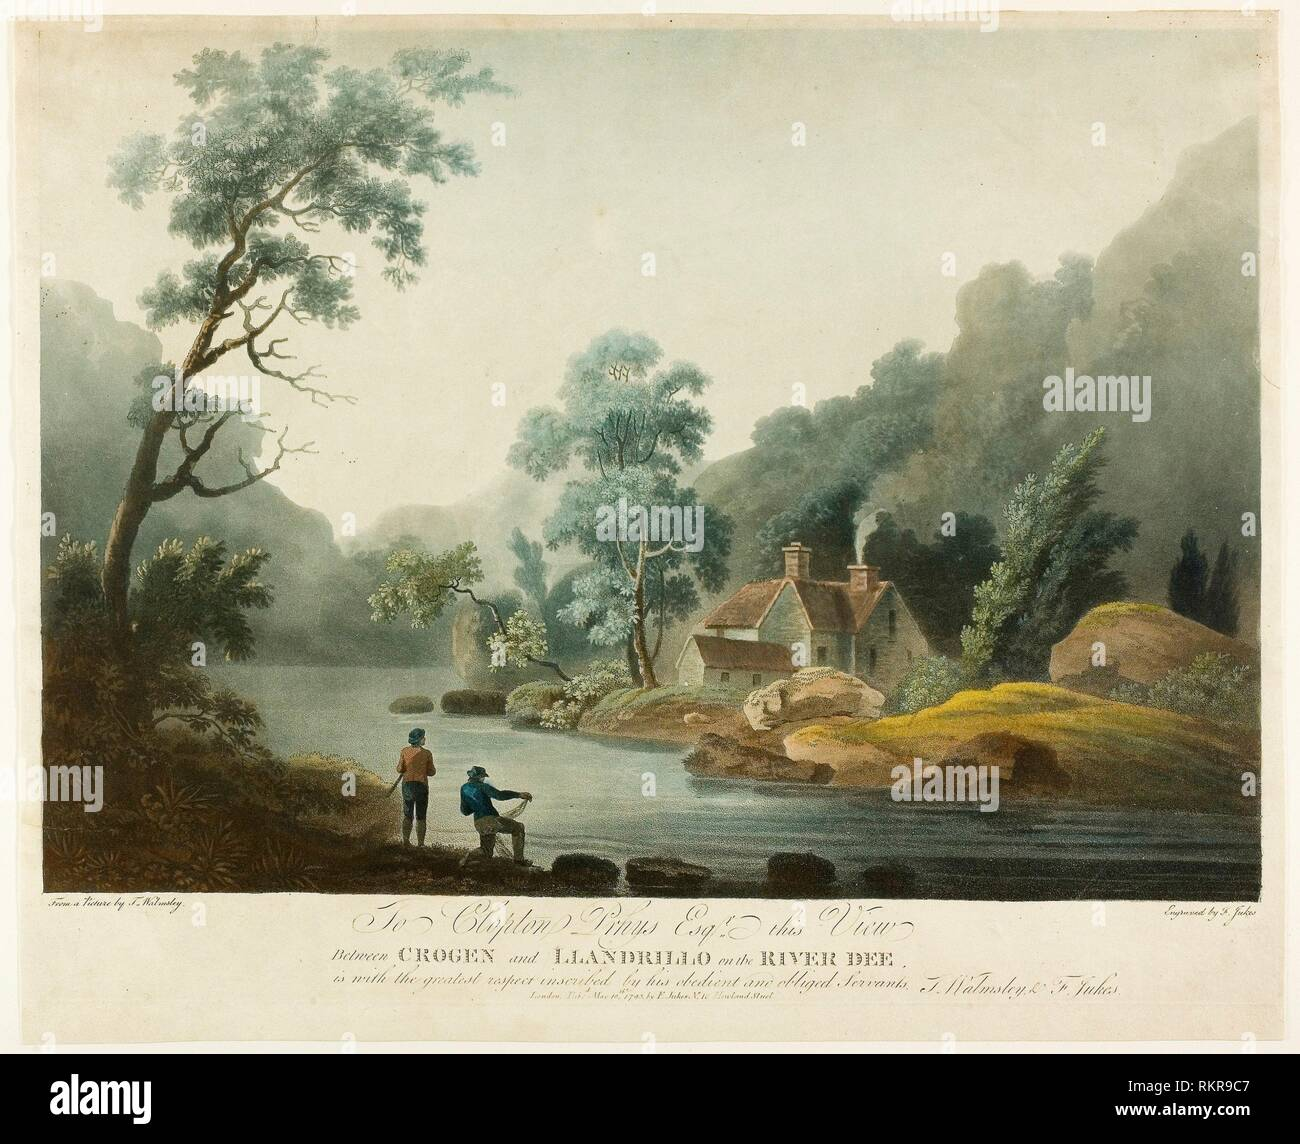 Between Crogen & Llandrillo on the R. Dee - published 1793 - Francis Jukes English, 1745-1812 - Artist: Francis Jukes, Origin: England, Date: 1793, Stock Photo